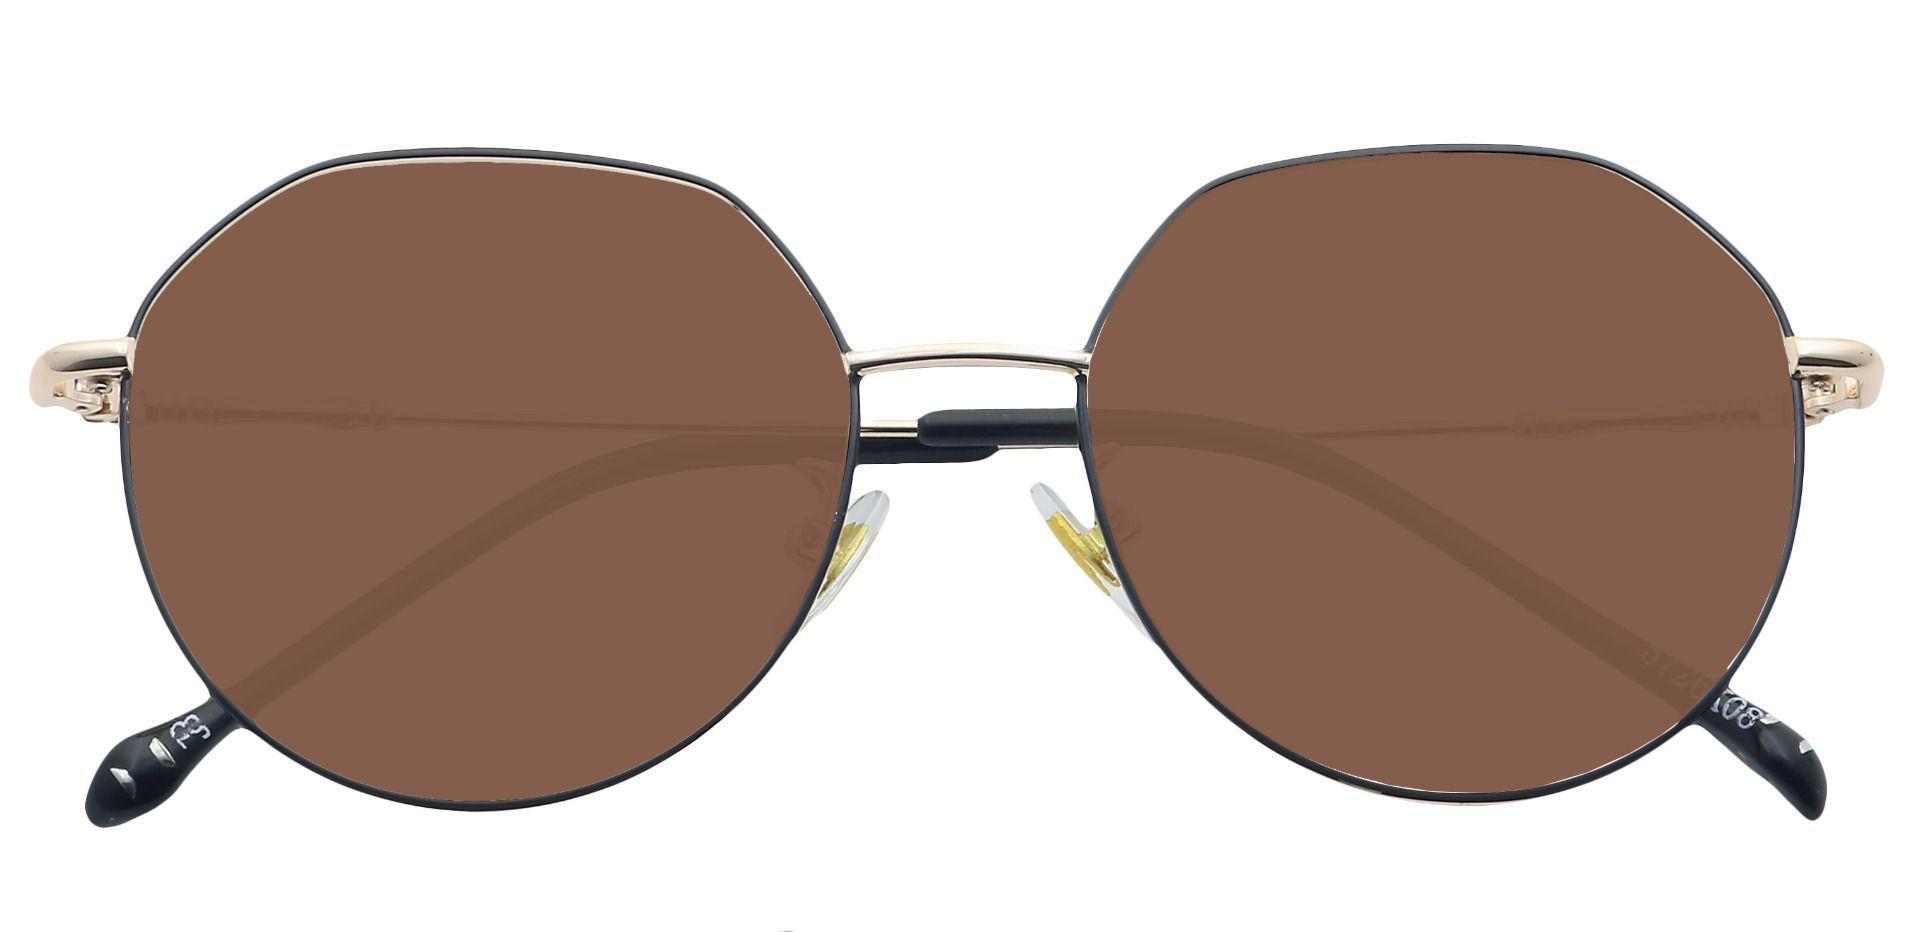 Wesley Round Prescription Sunglasses - Black Frame With Brown Lenses